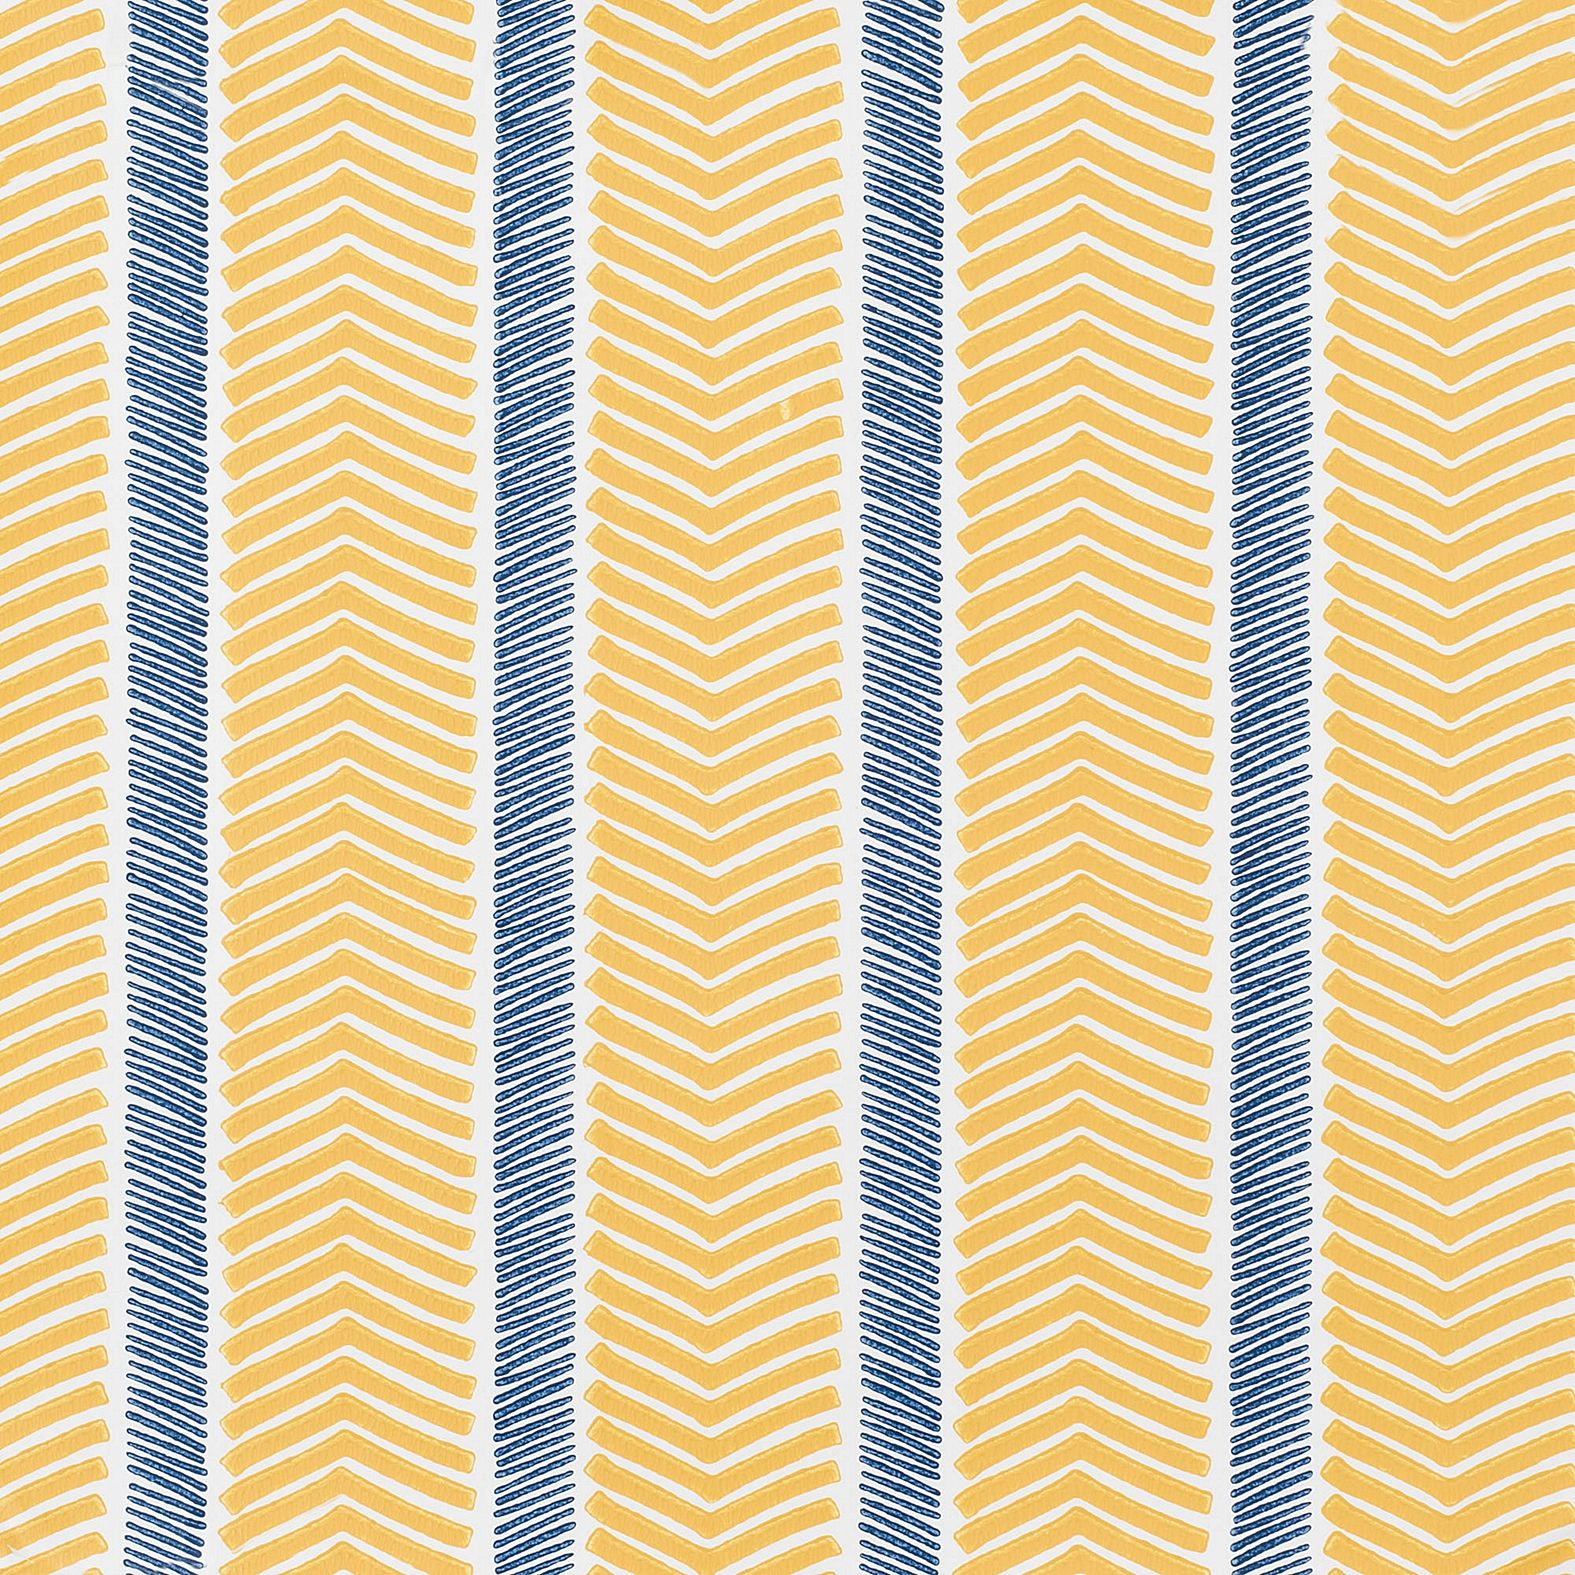 Herringbone Wallpaper Swatch – Maize/Navy | Serena & Lily | Palette ...